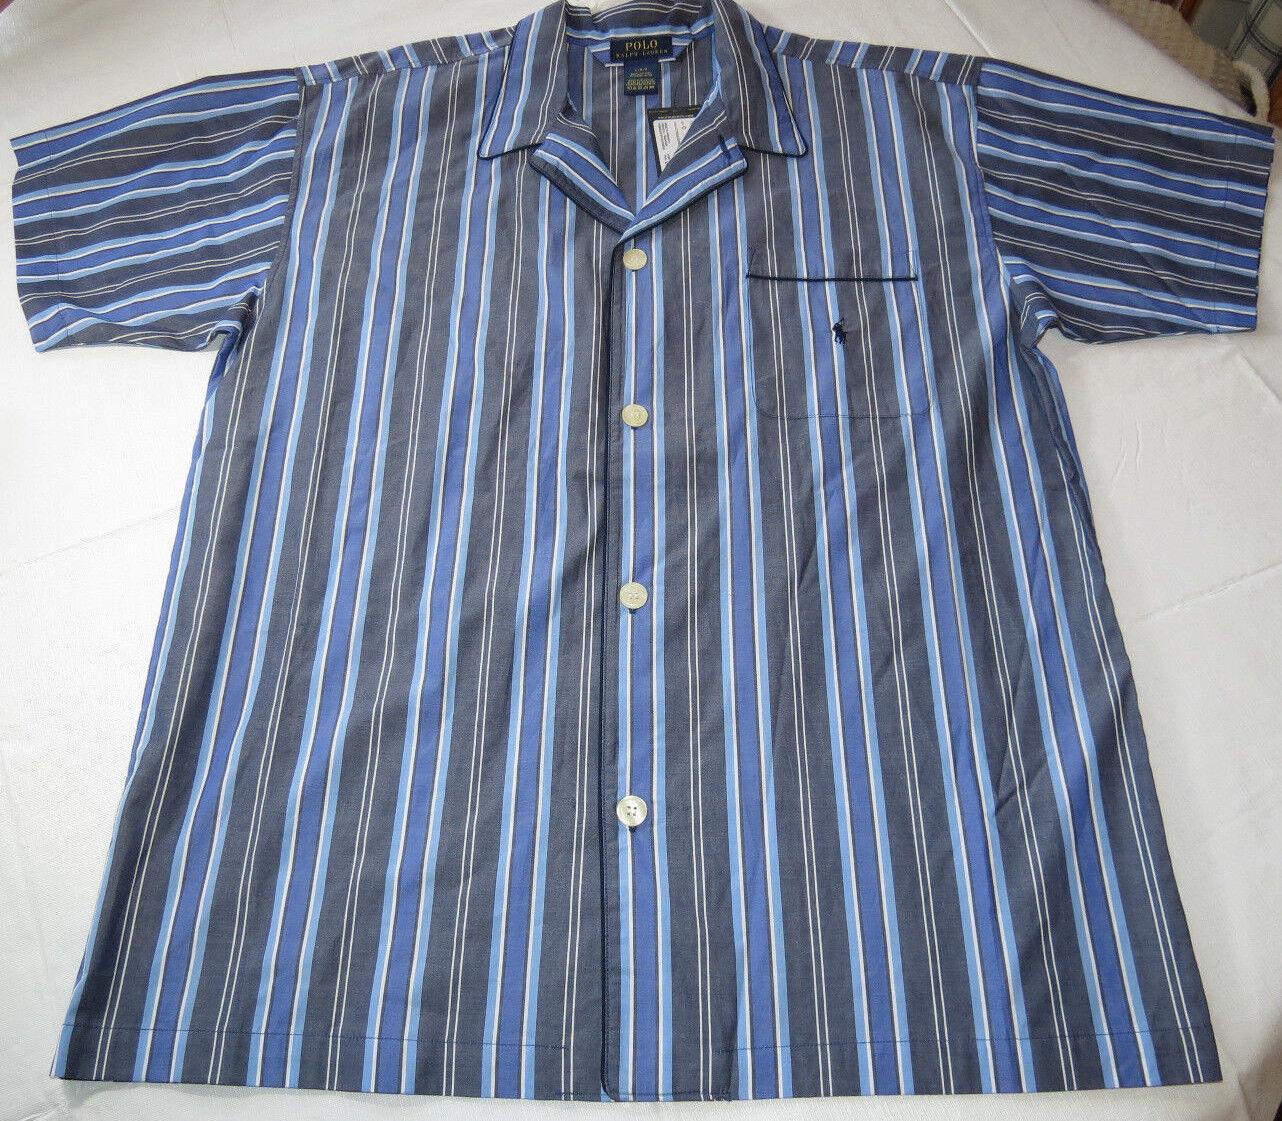 Men's Polo Sleep shirt PJ night shirt logo XL xlarge bluees white stripes P506SR